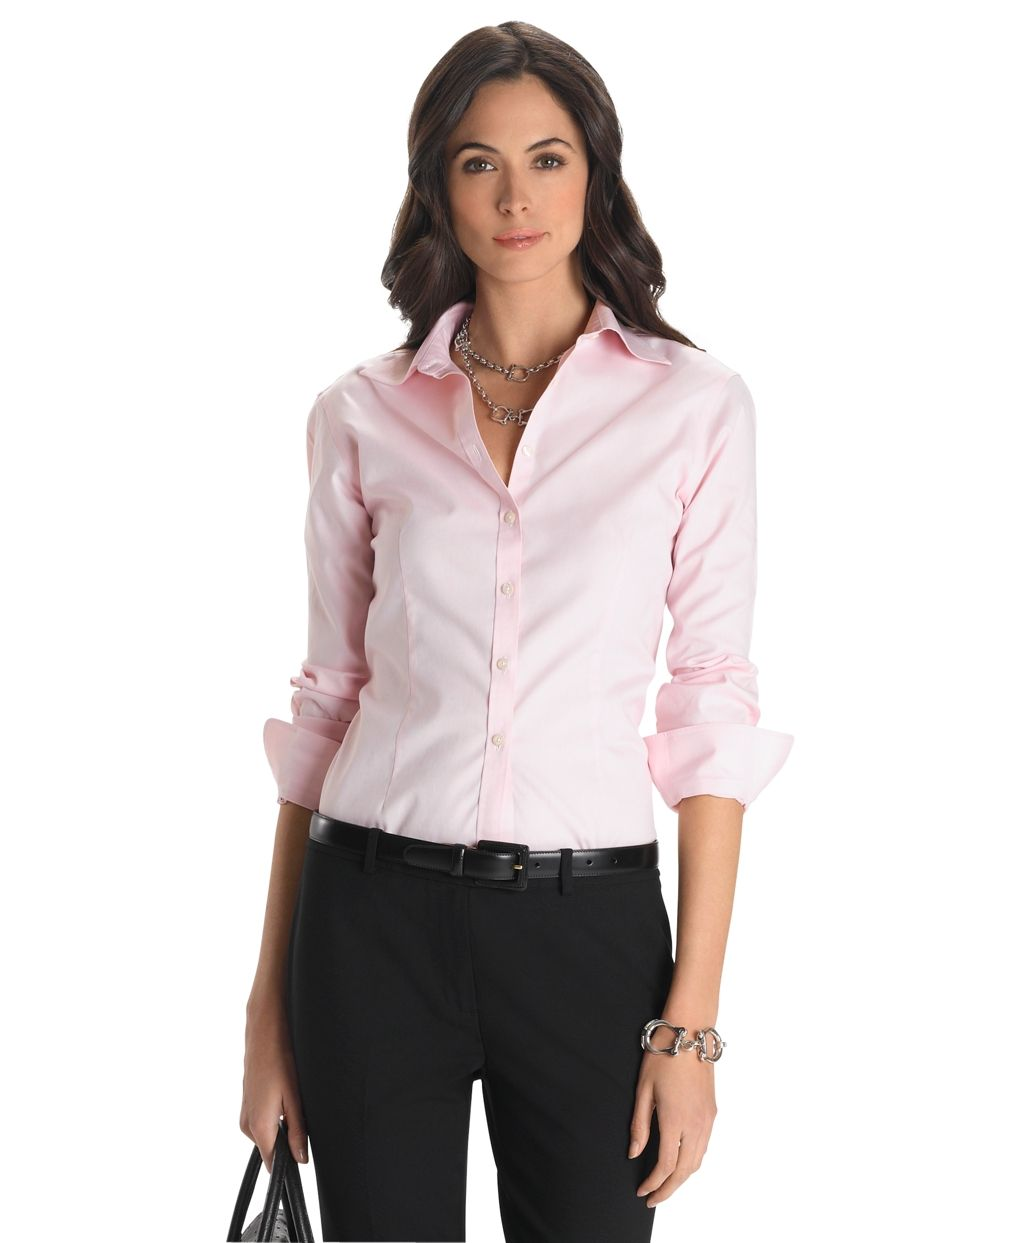 6bb486bb Fitted Dress Shirts Womens - DREAMWORKS